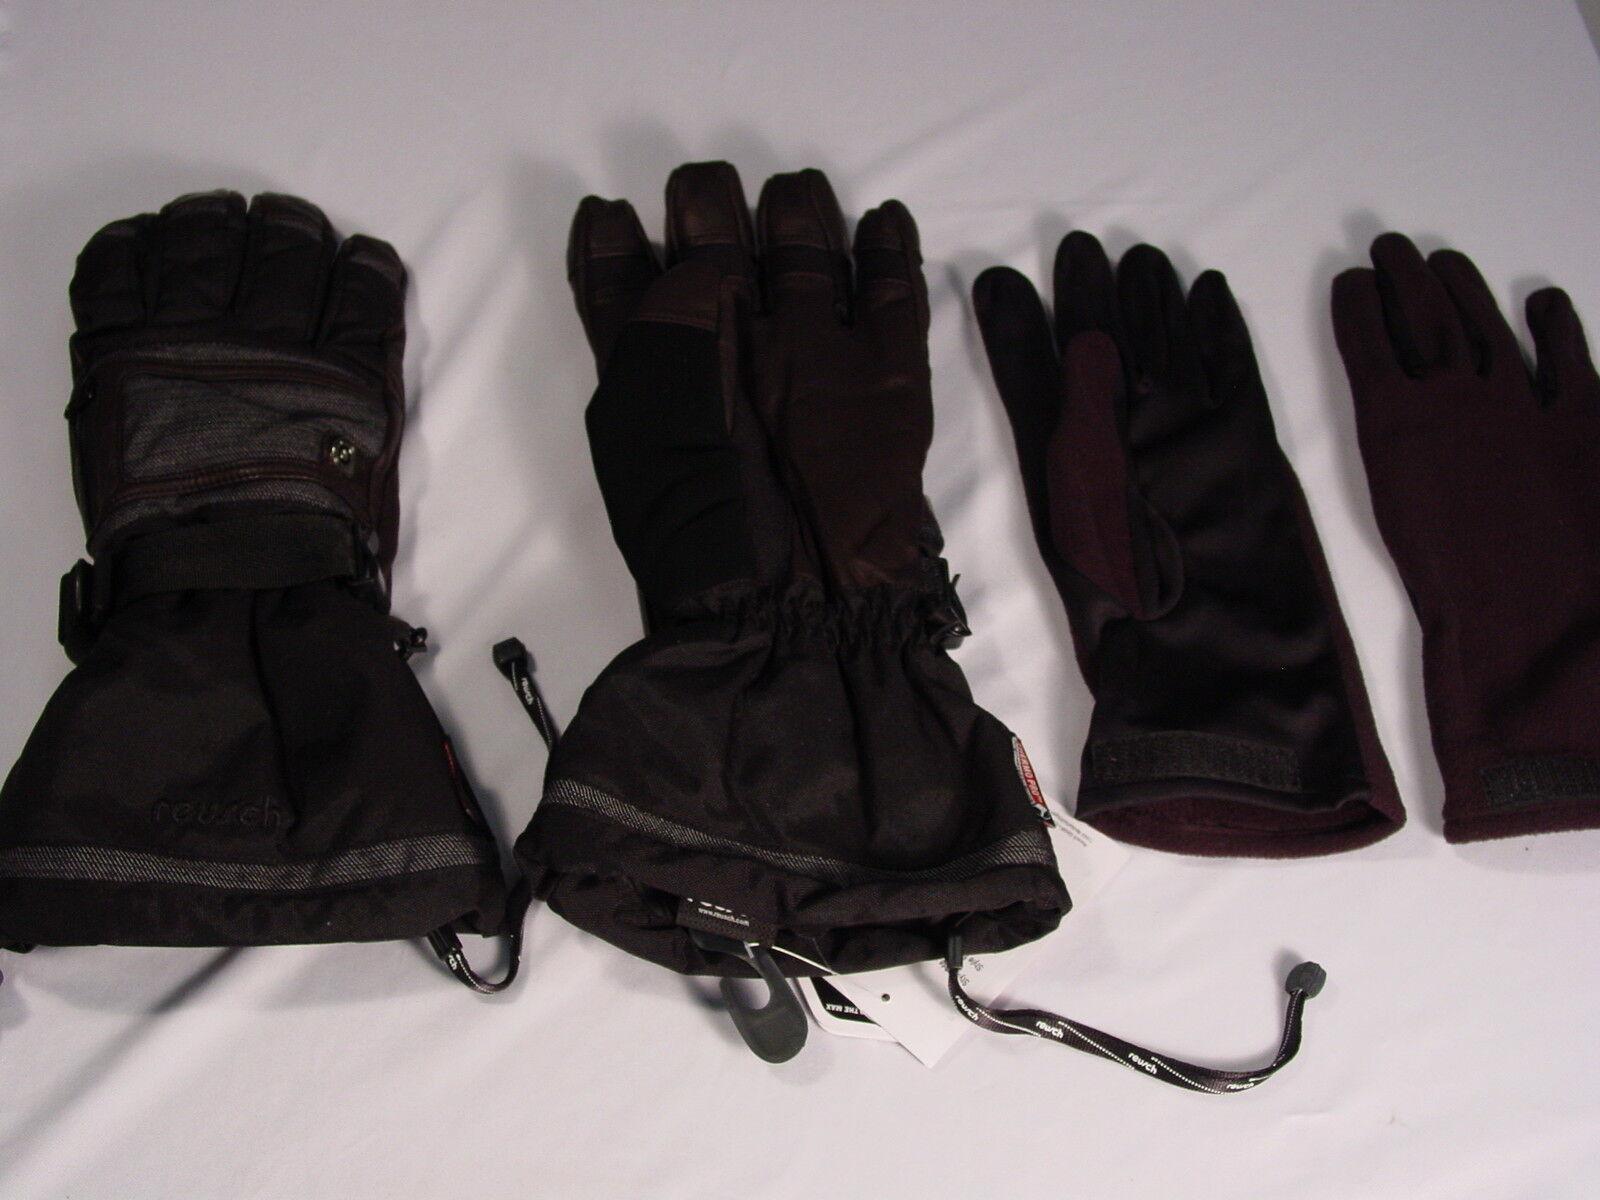 3 in 1 Reusch Schnee Leder Palmen Ski Handschuhe Medium 8.5 Kelle Rtex 2904206